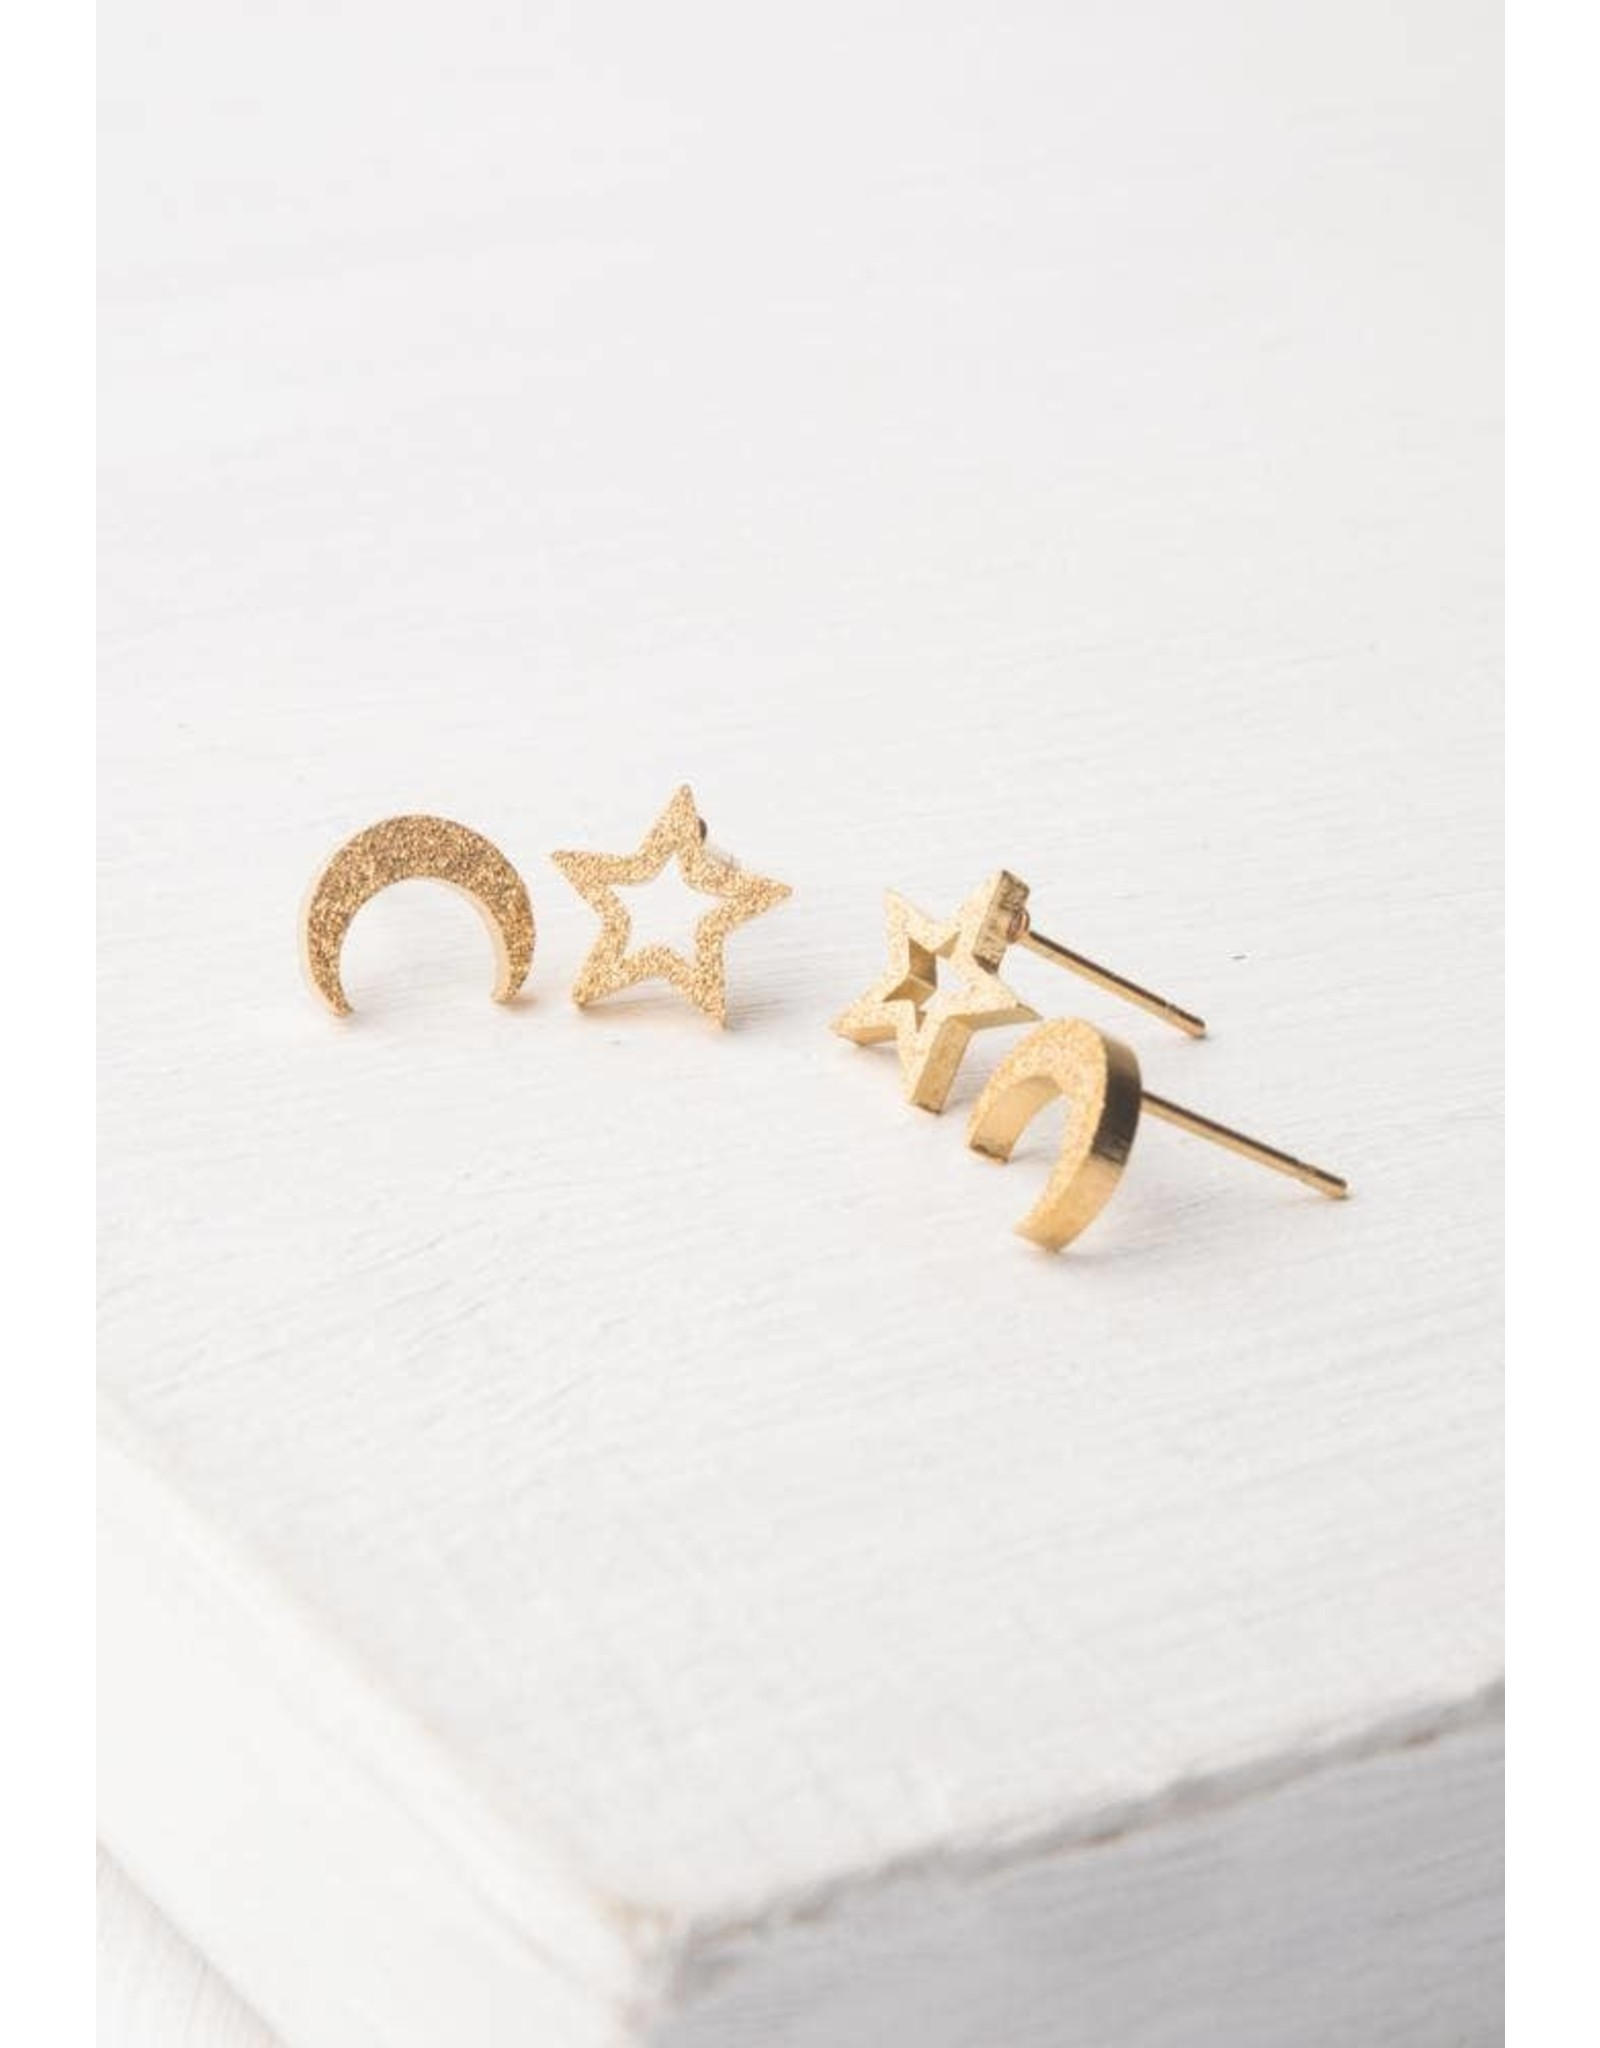 Aurora Gold Plated Studs, China